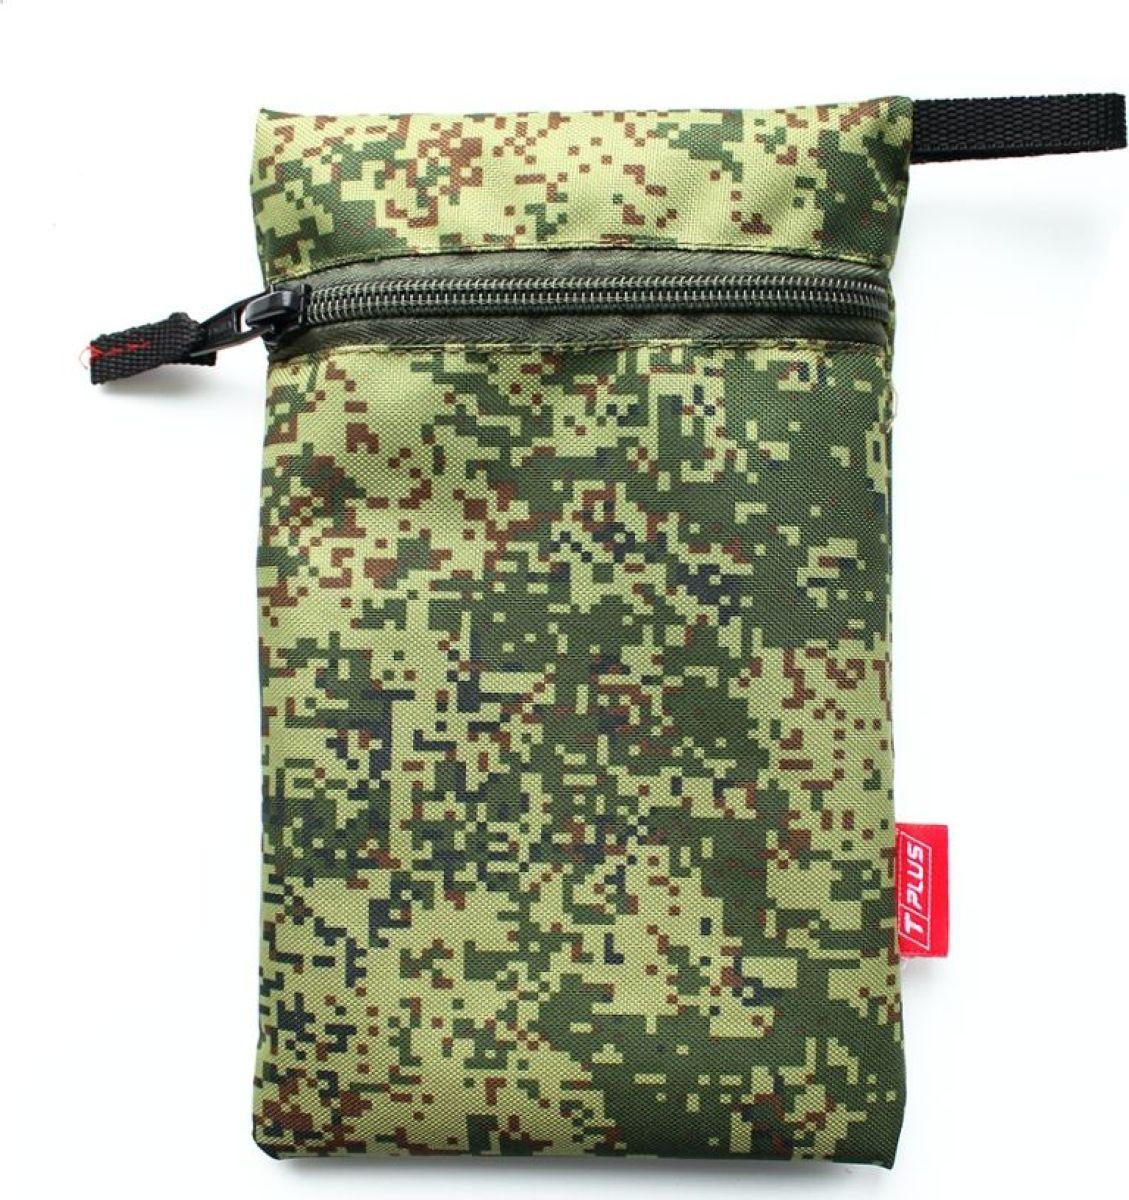 Мешок вещевой Tplus 600, цвет: цифра, 13 x 20 см сумка рыбака tplus 600 цвет цифра 40 x 22 x 24 см